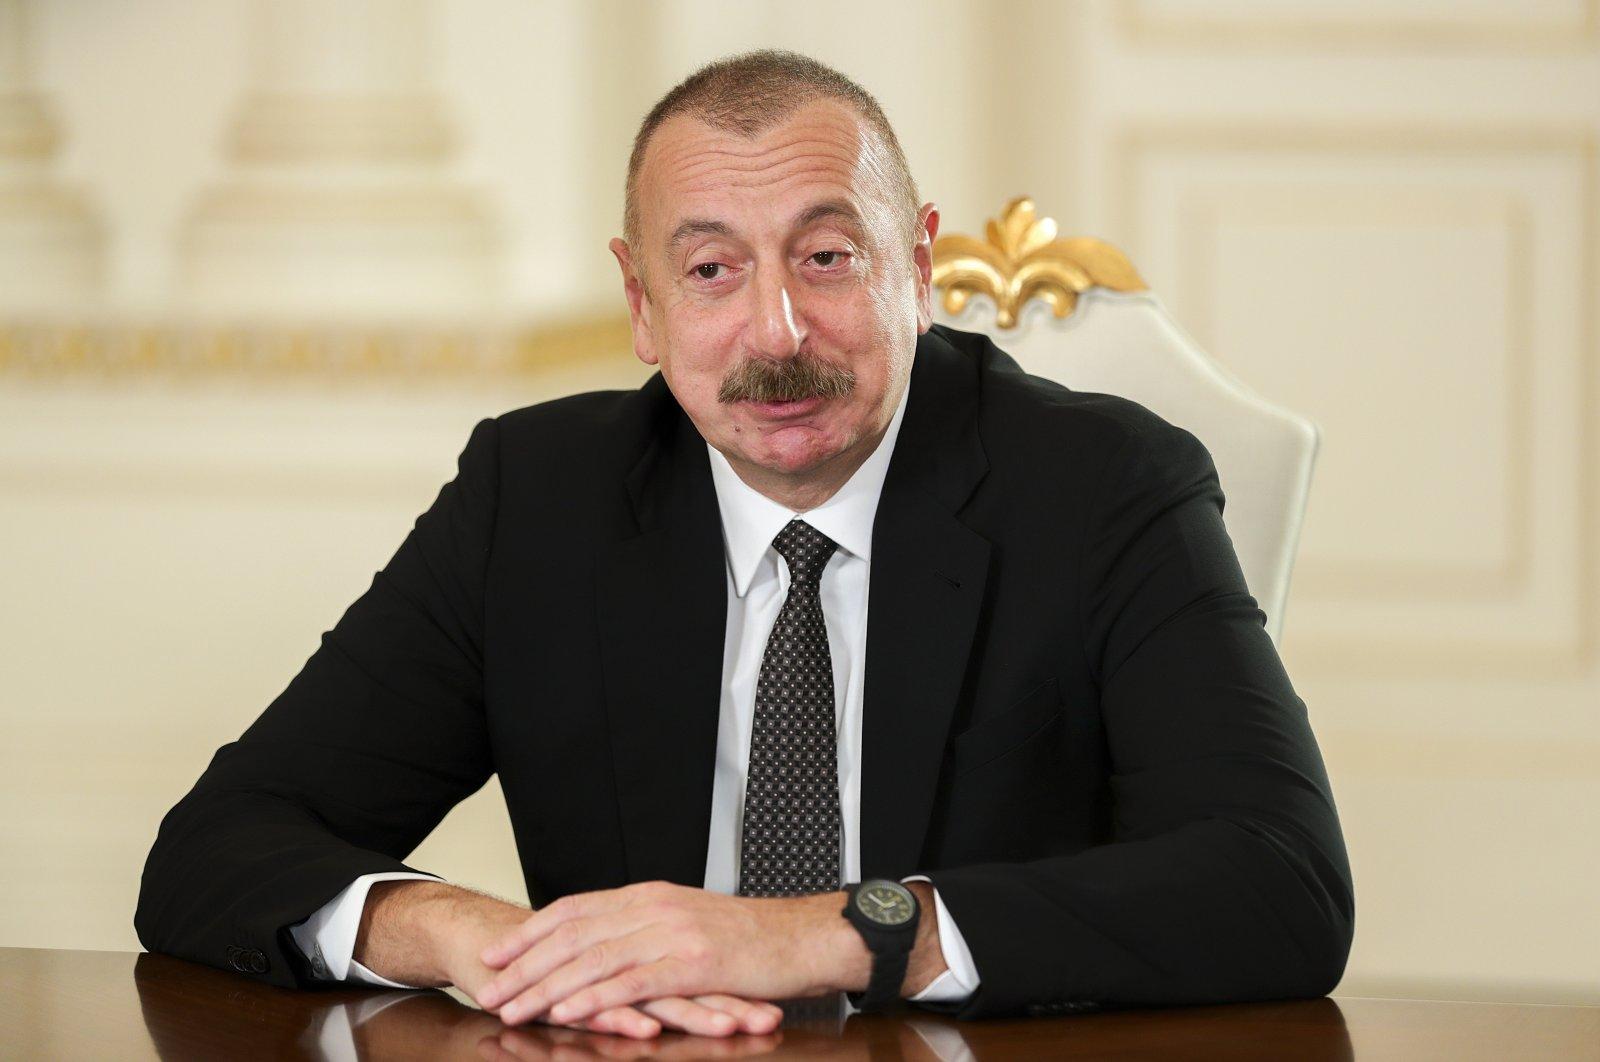 Azerbaijani President Ilham Aliyev speaks during a meeting in Baku, Azerbaijan,  May 10, 2021. (AP Photo)